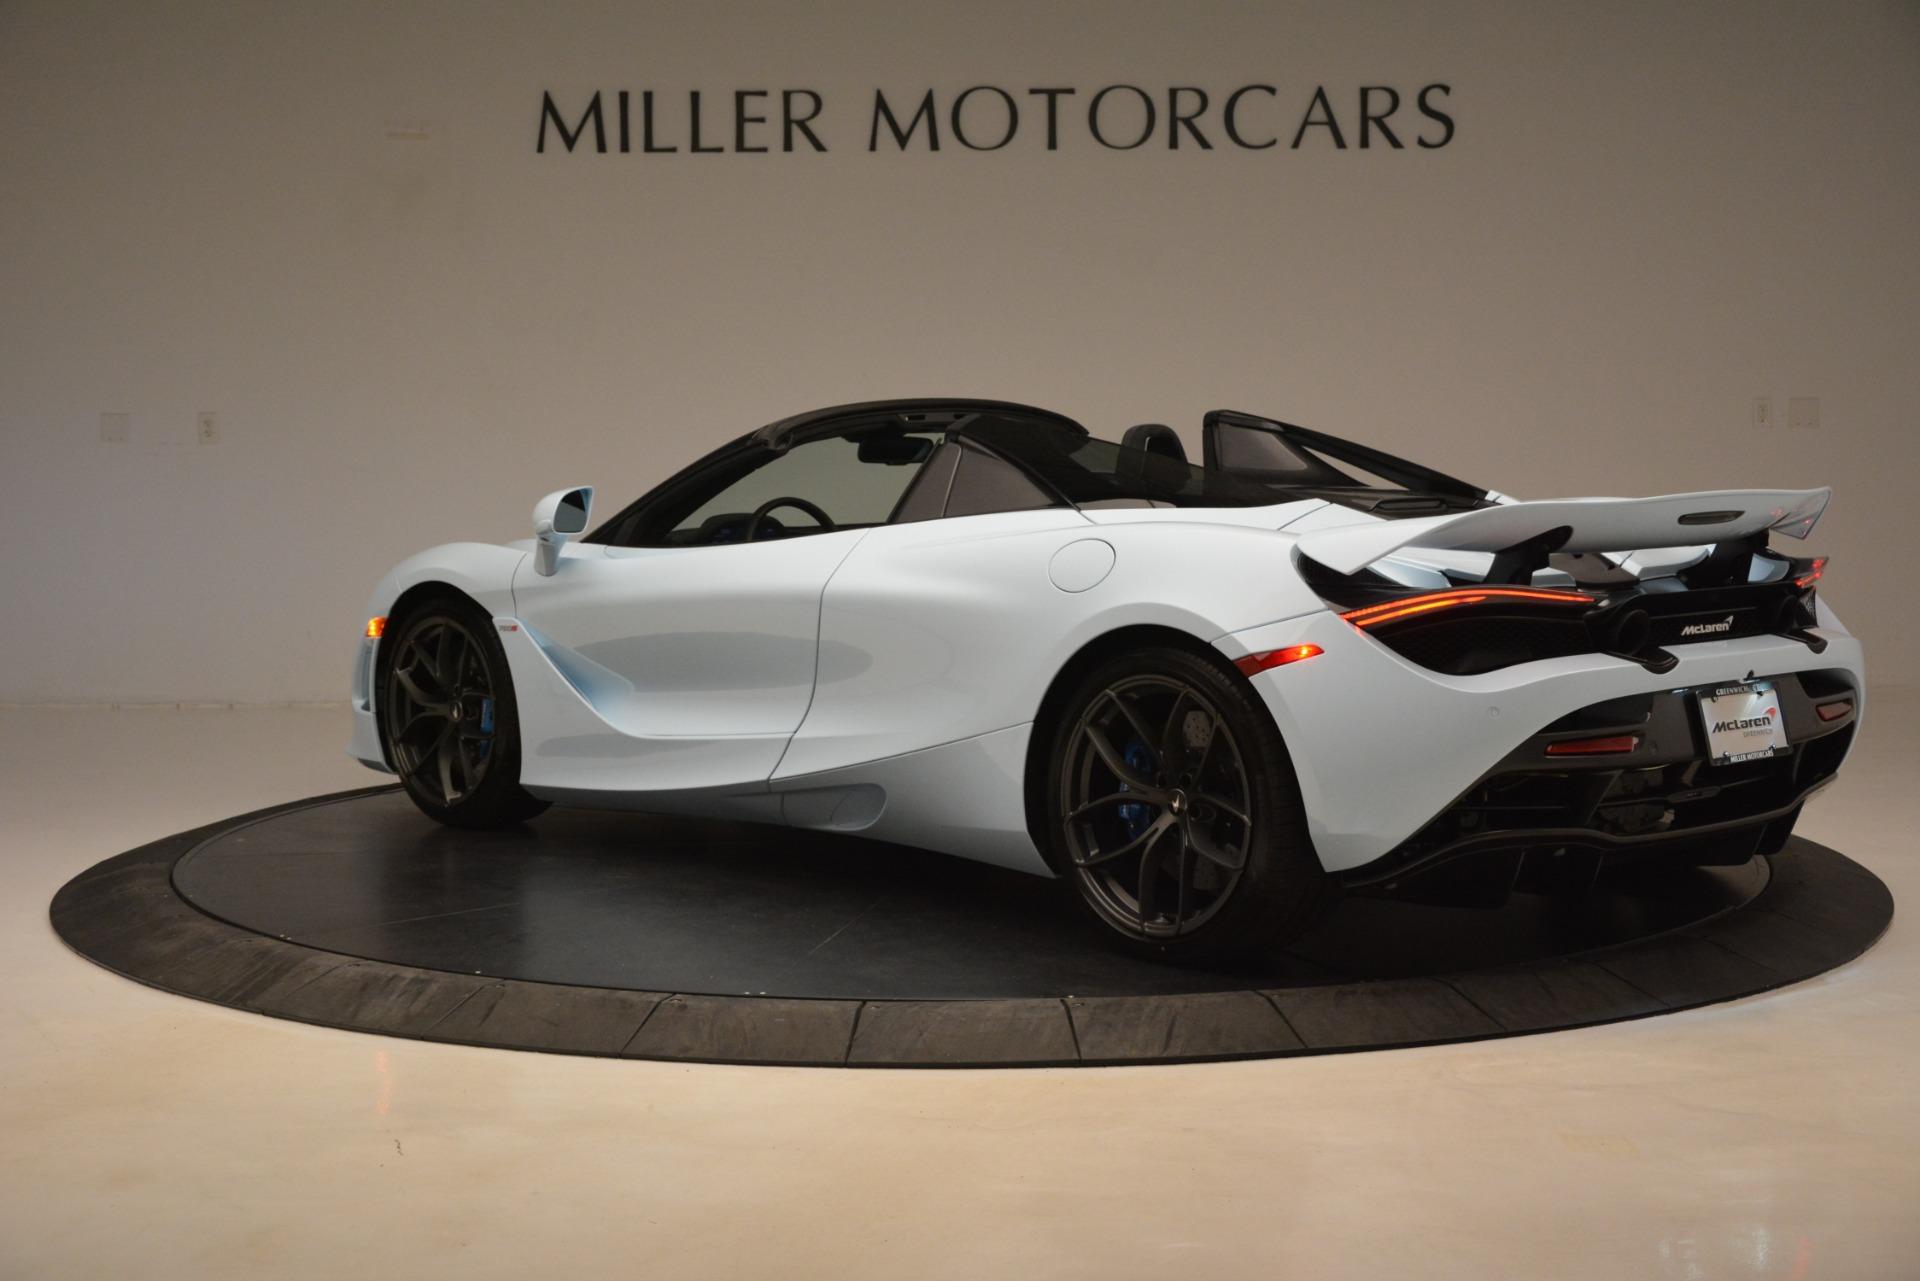 New 2020 McLaren 720S Spider For Sale In Greenwich, CT 3191_p3